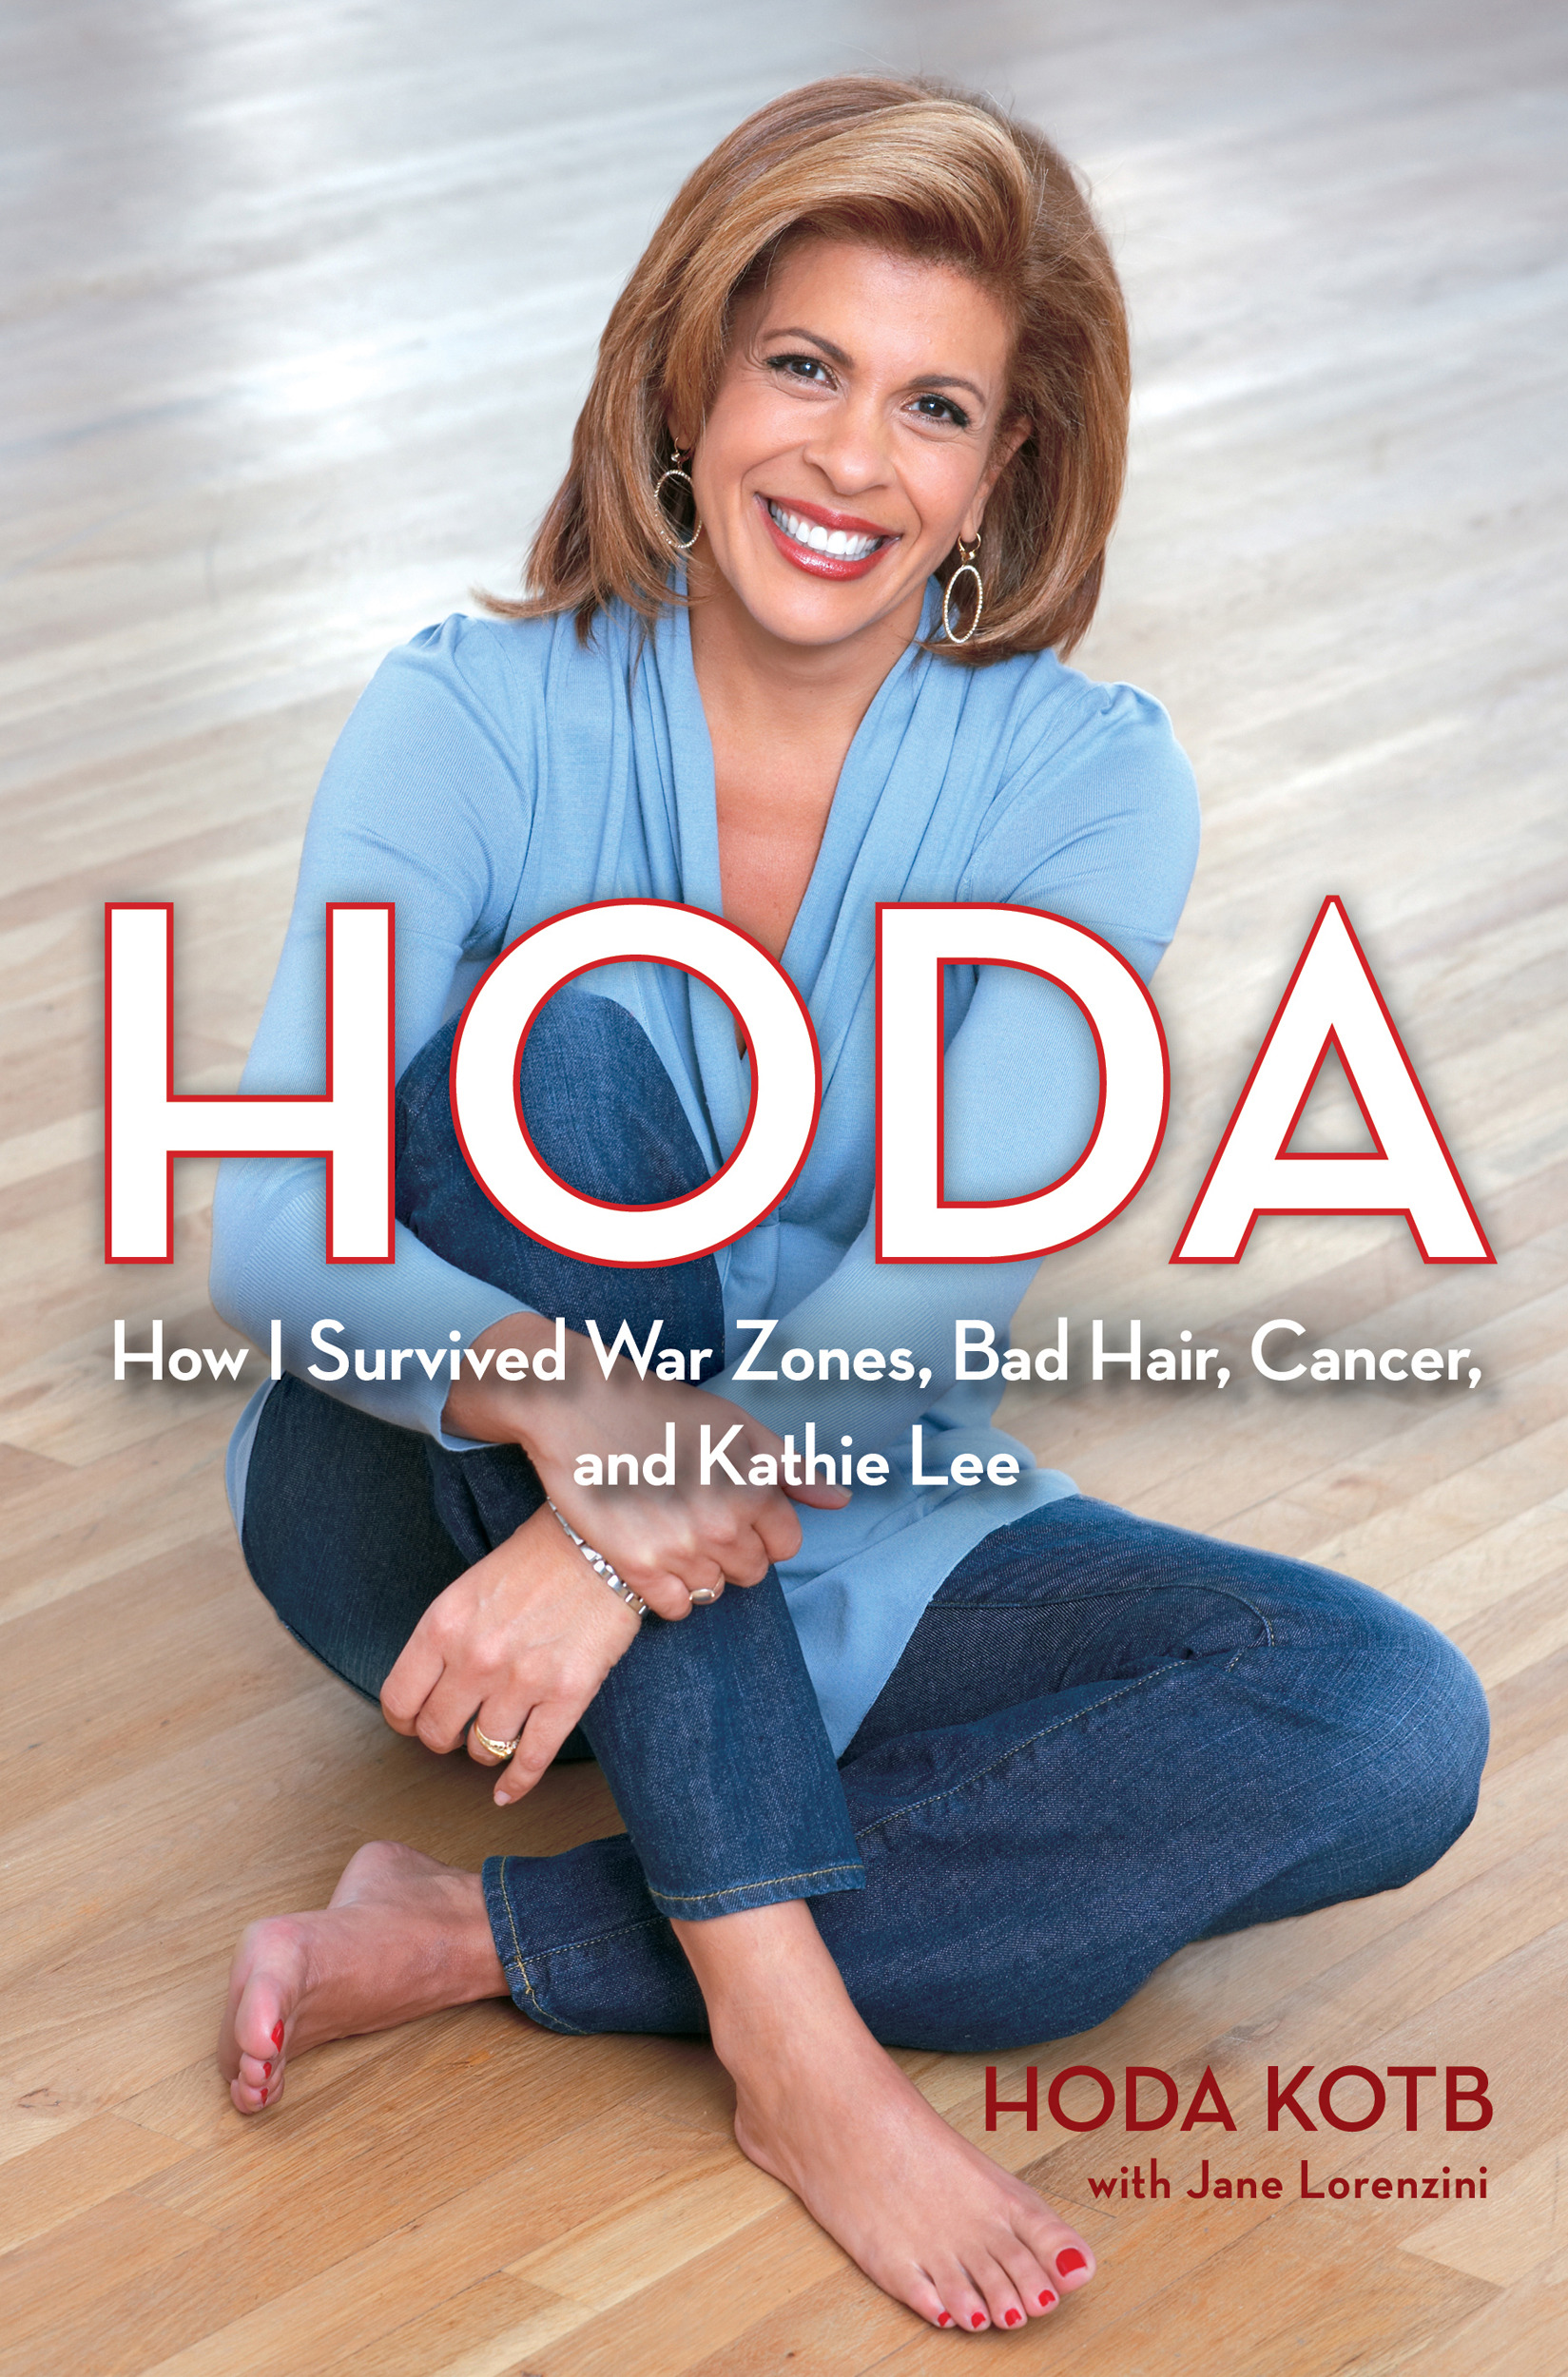 Hoda egyptian whore 2 with voice 8